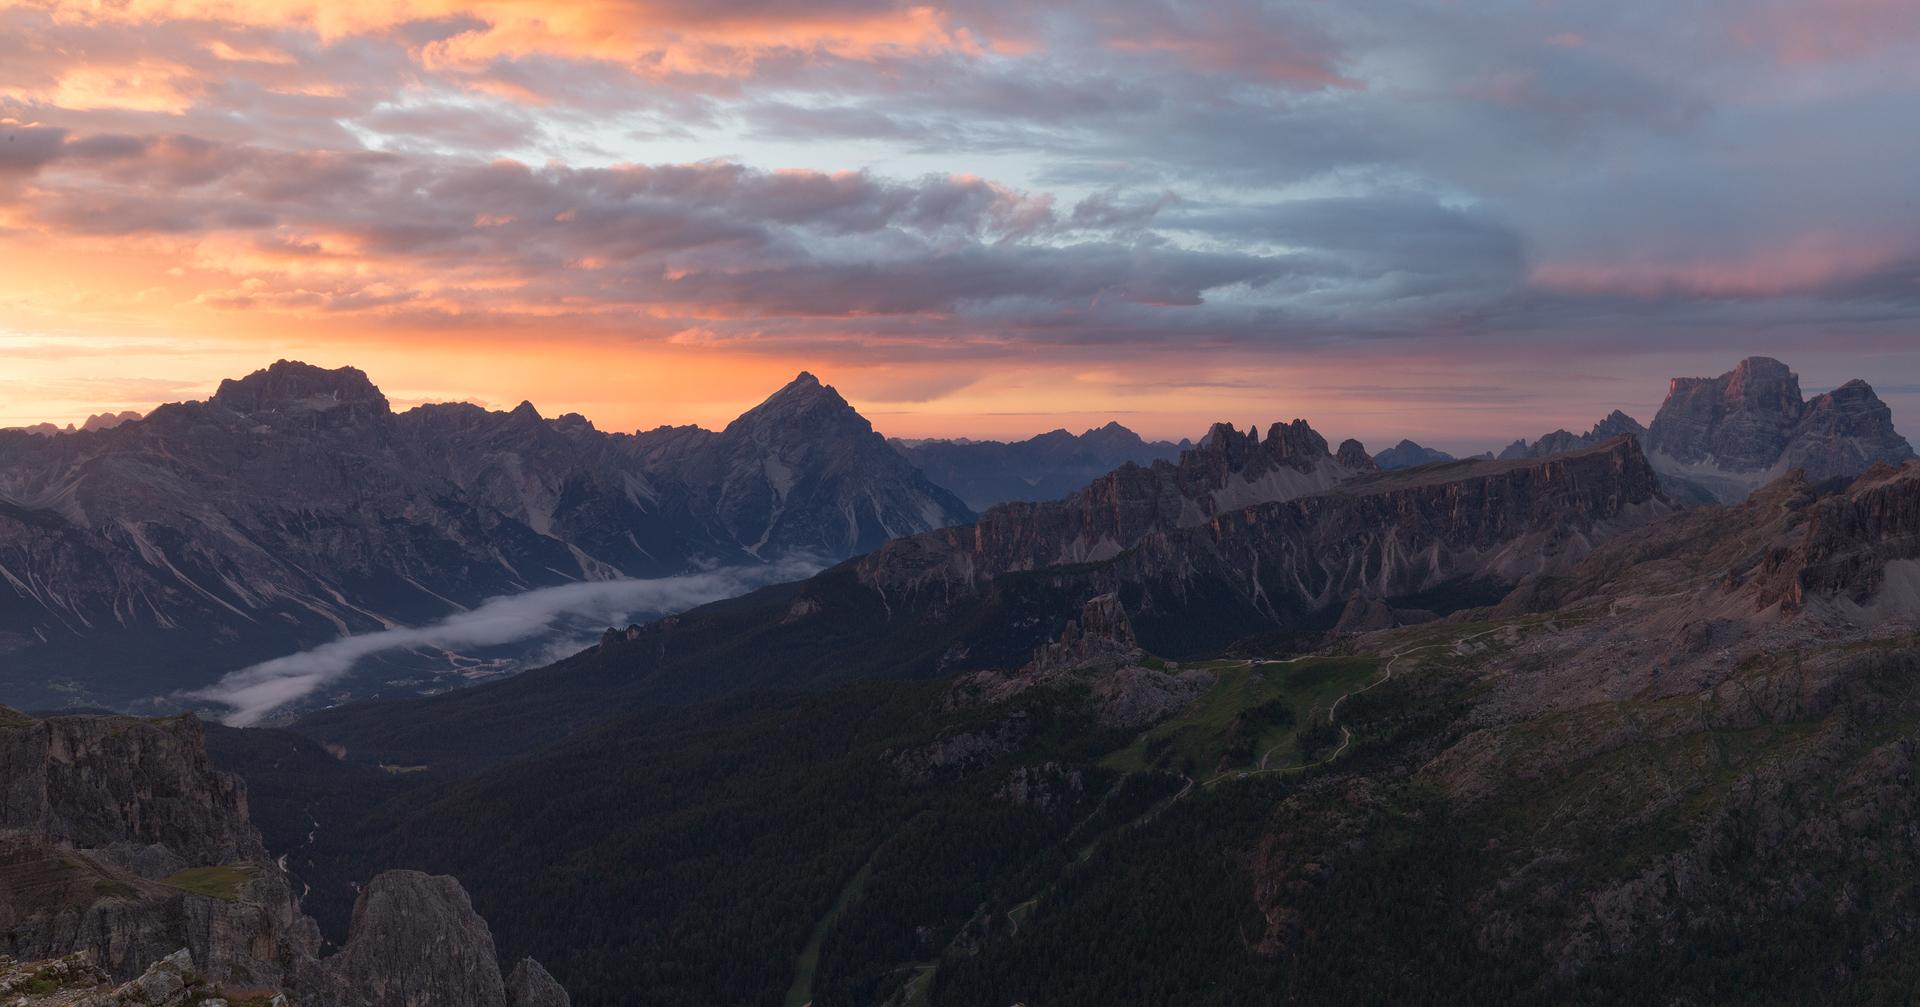 Sunrise from Rifugio Lagazuoi